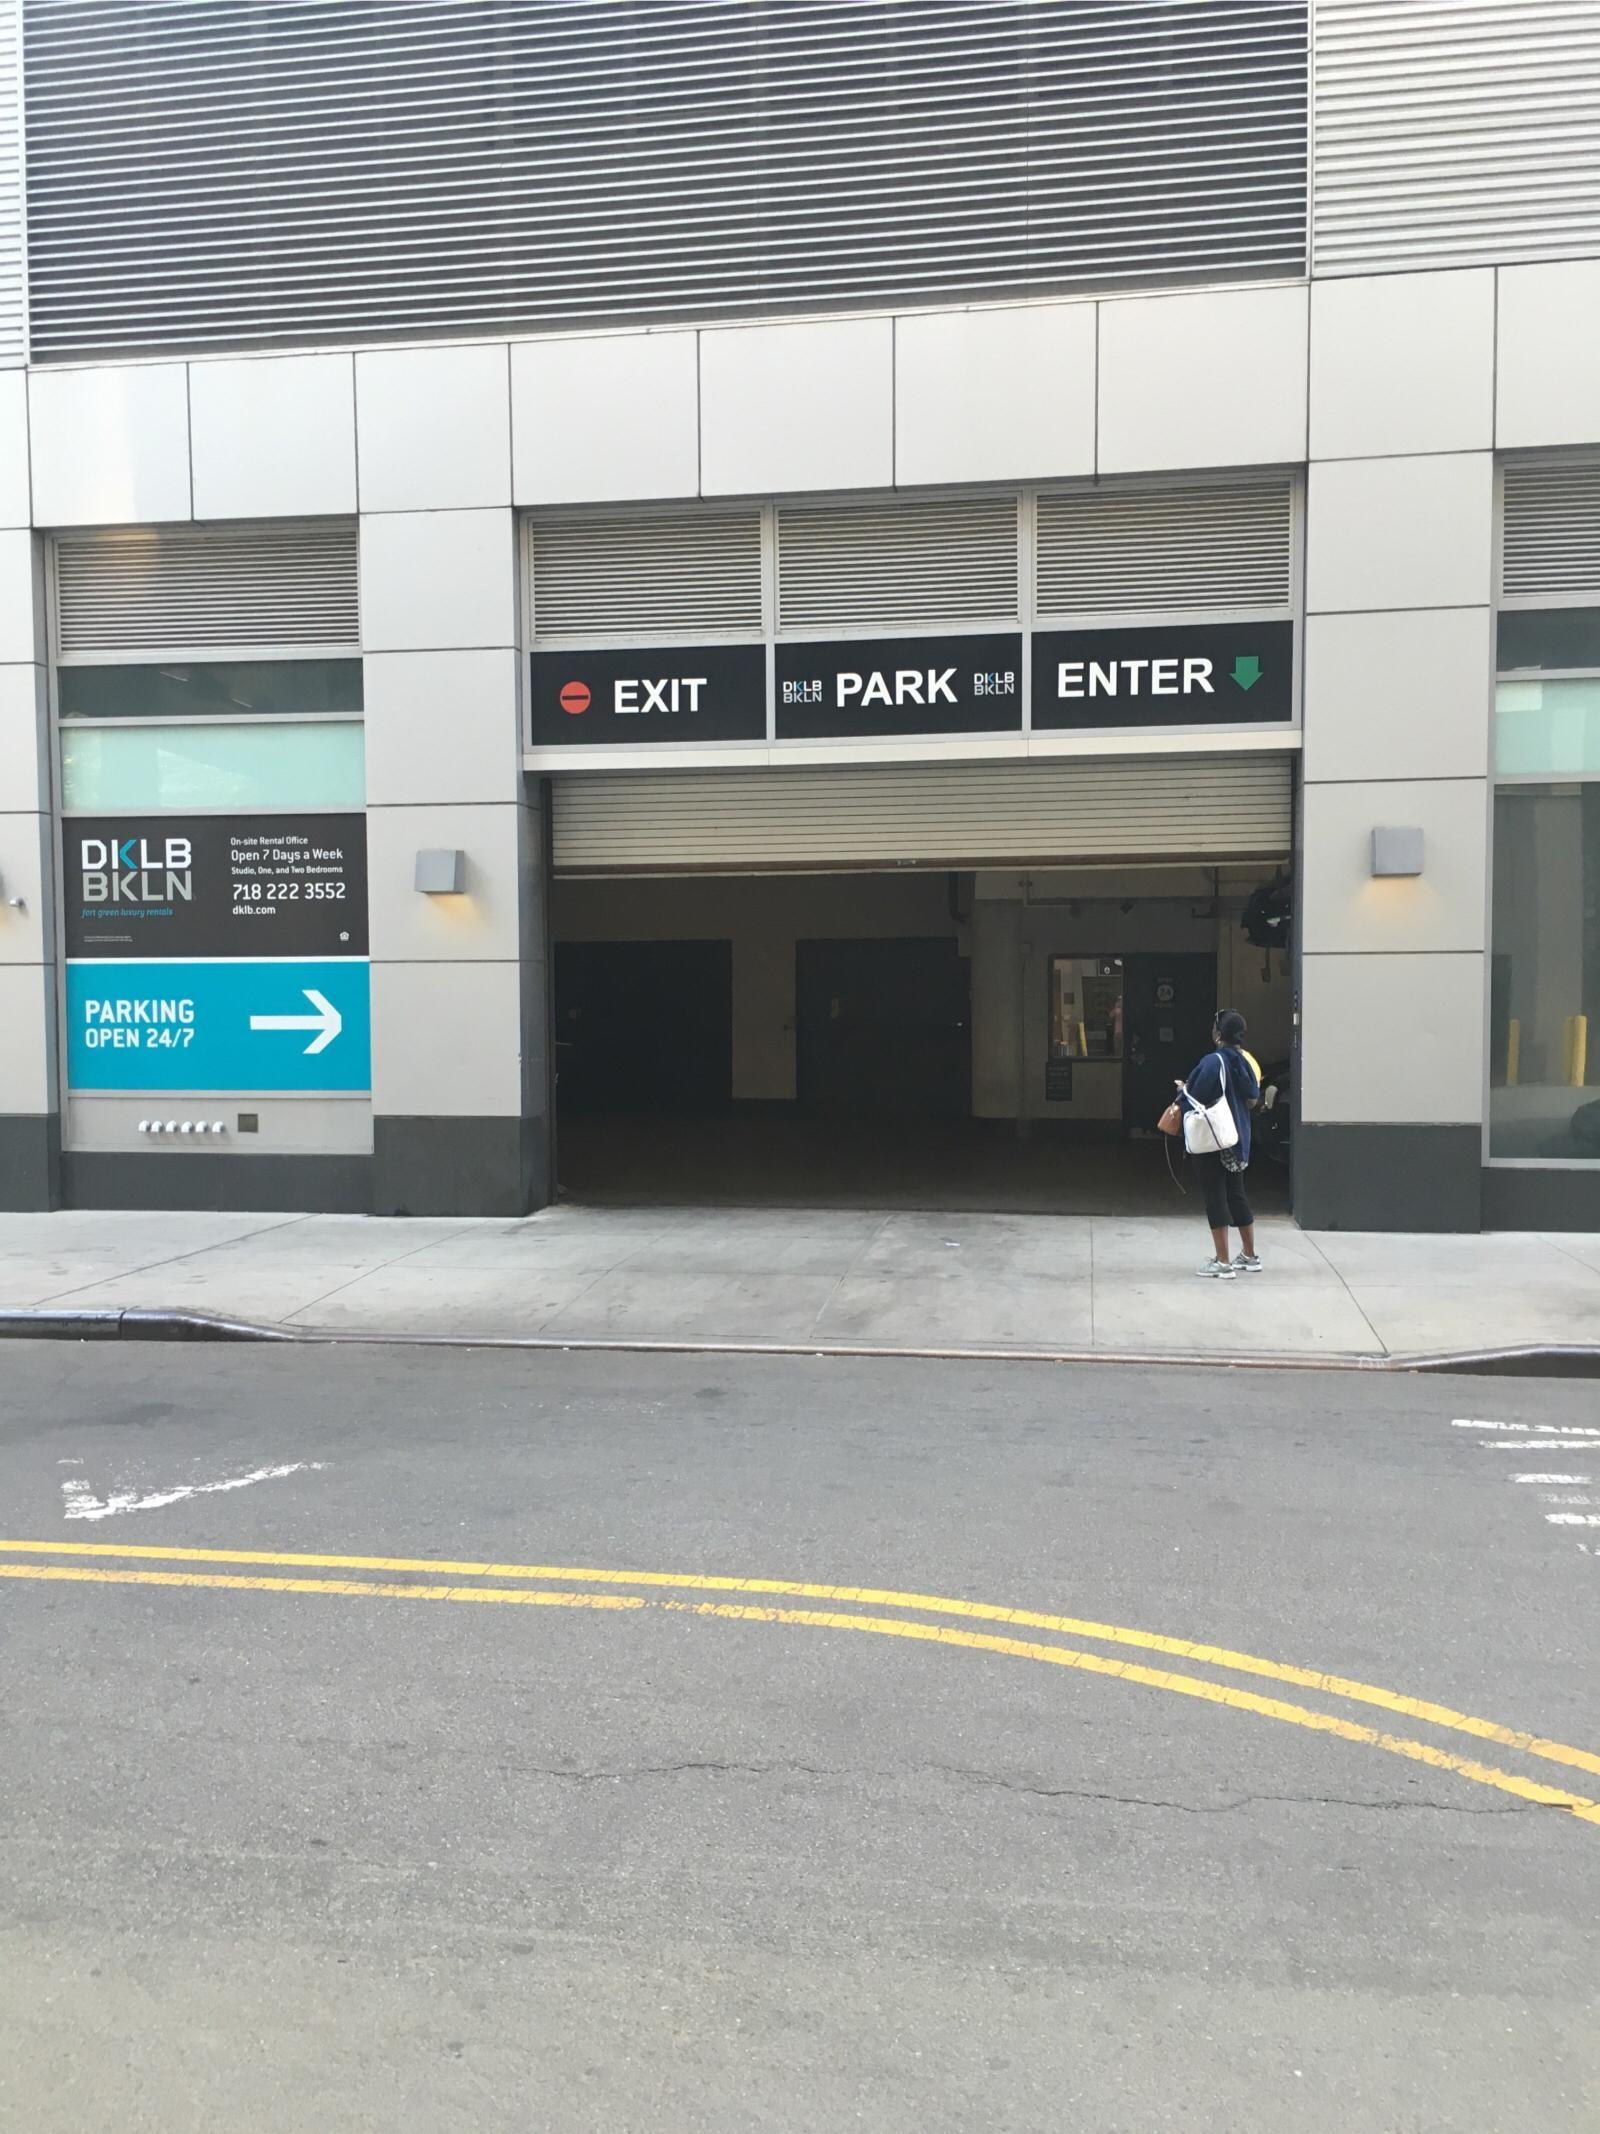 74 dekalb ave garage parking in new york parkme for New york parking garage